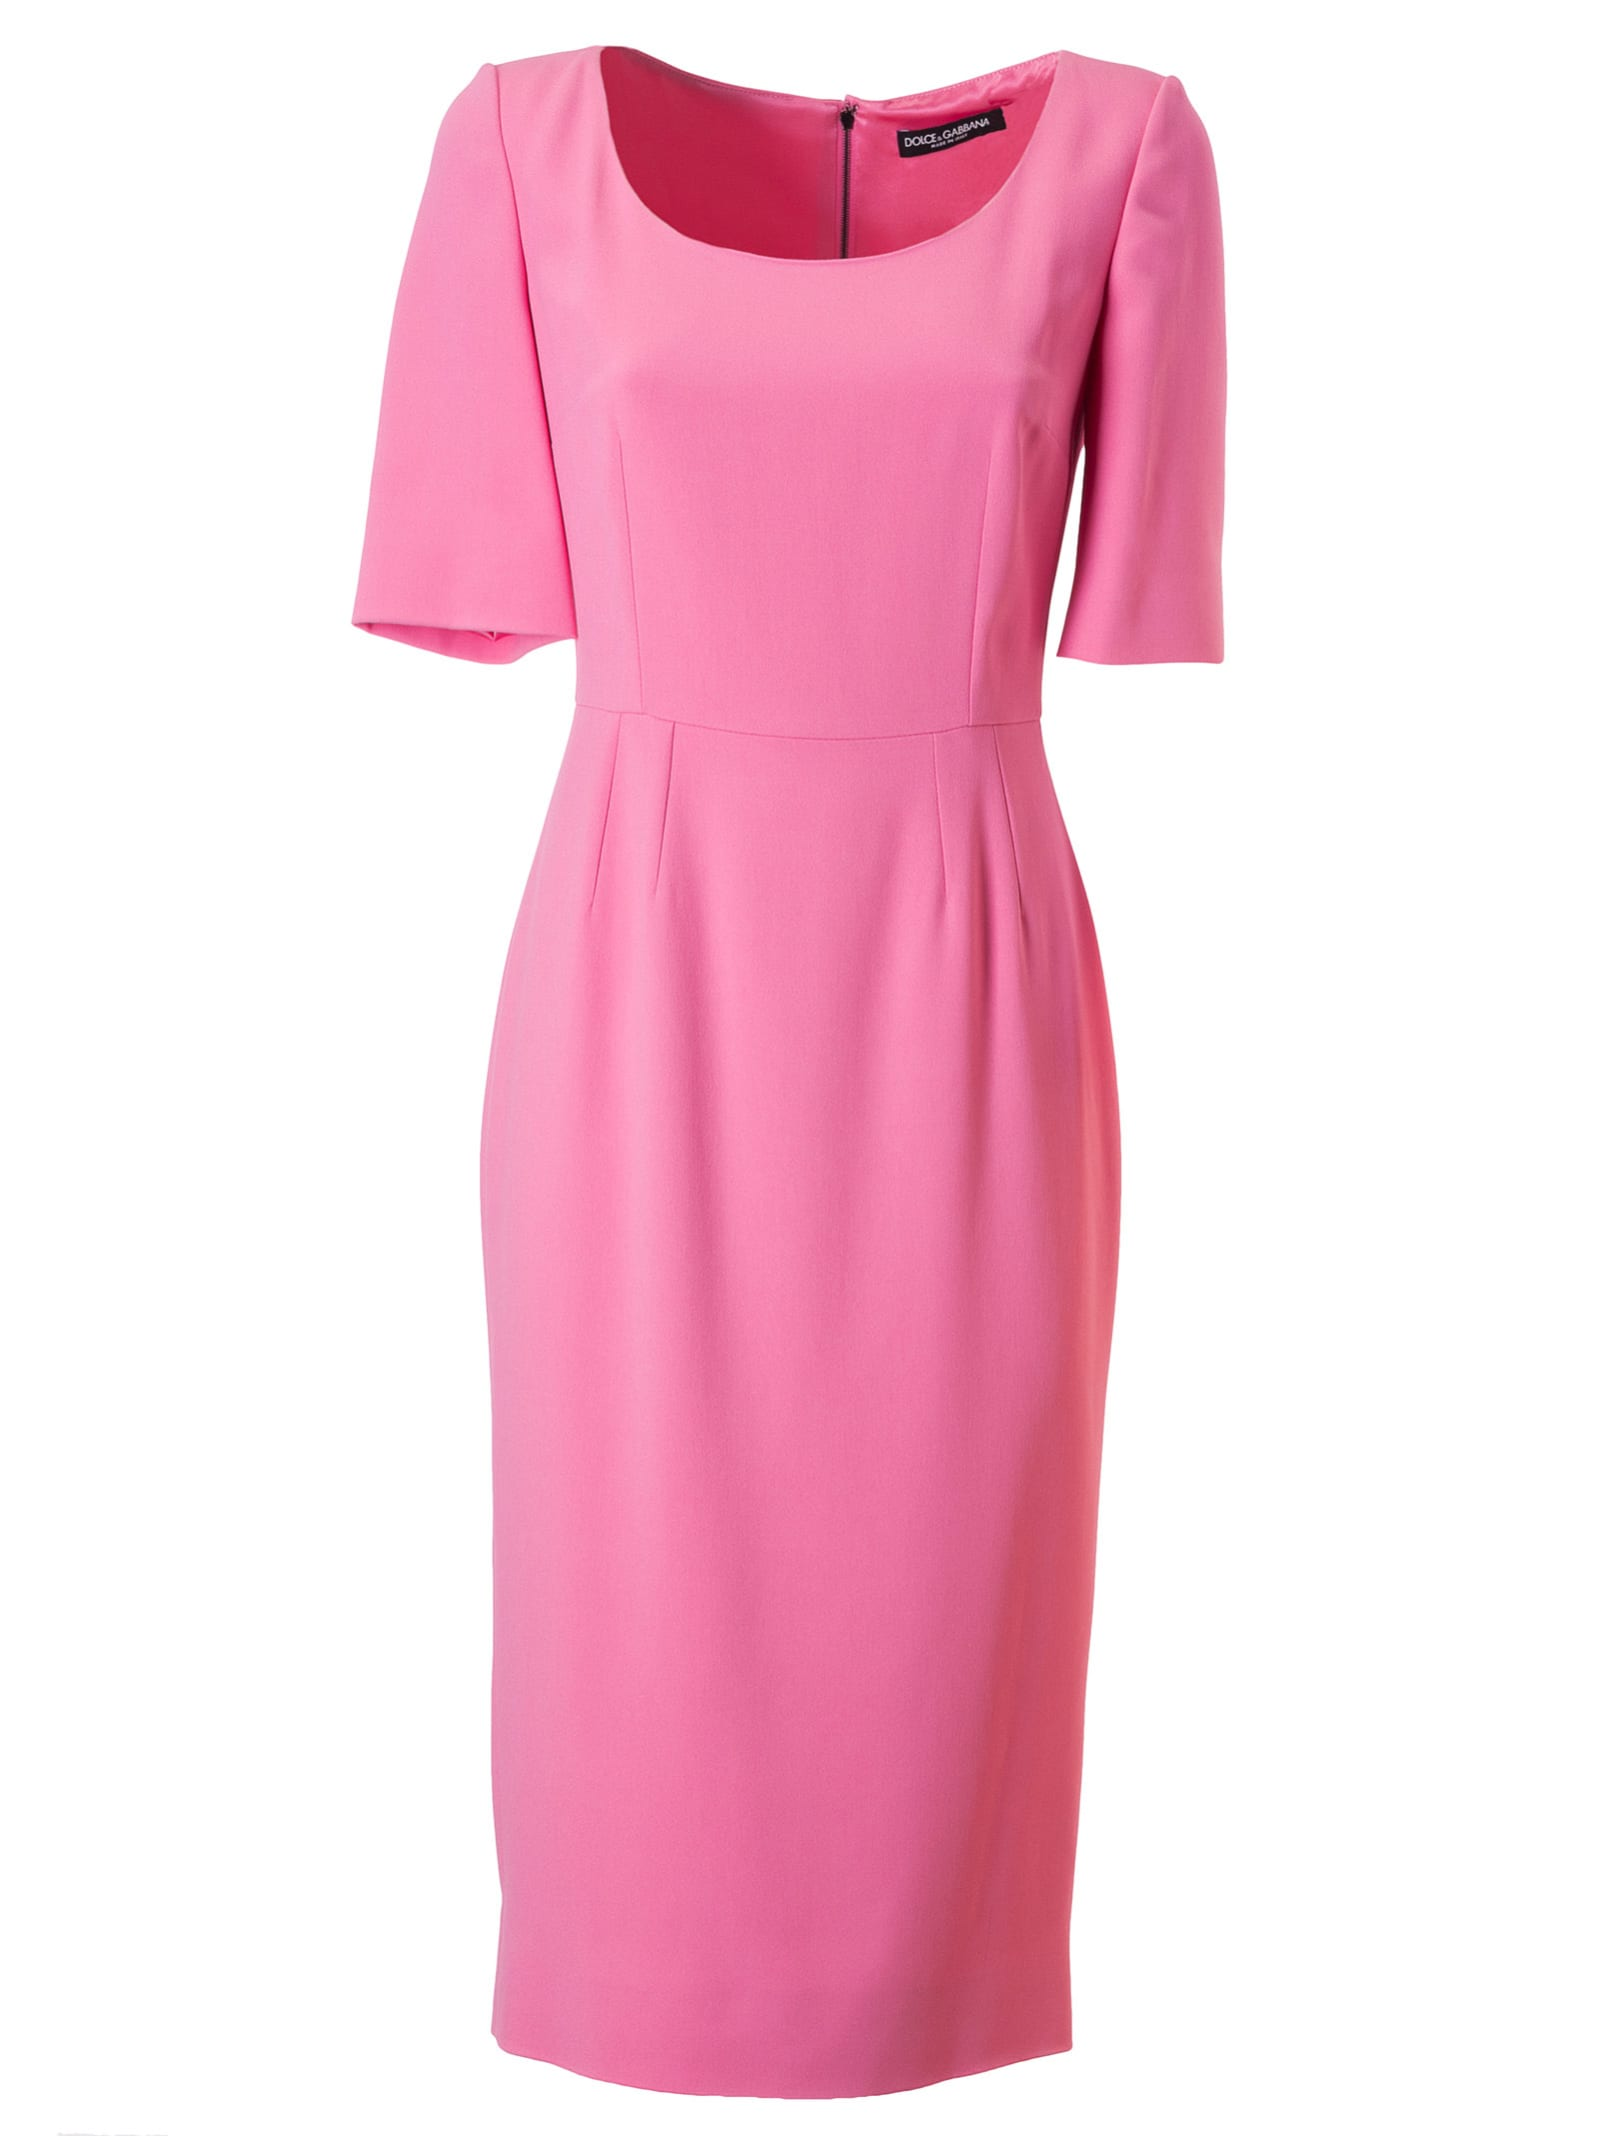 Buy Dolce & Gabbana Back-zipped Dress online, shop Dolce & Gabbana with free shipping